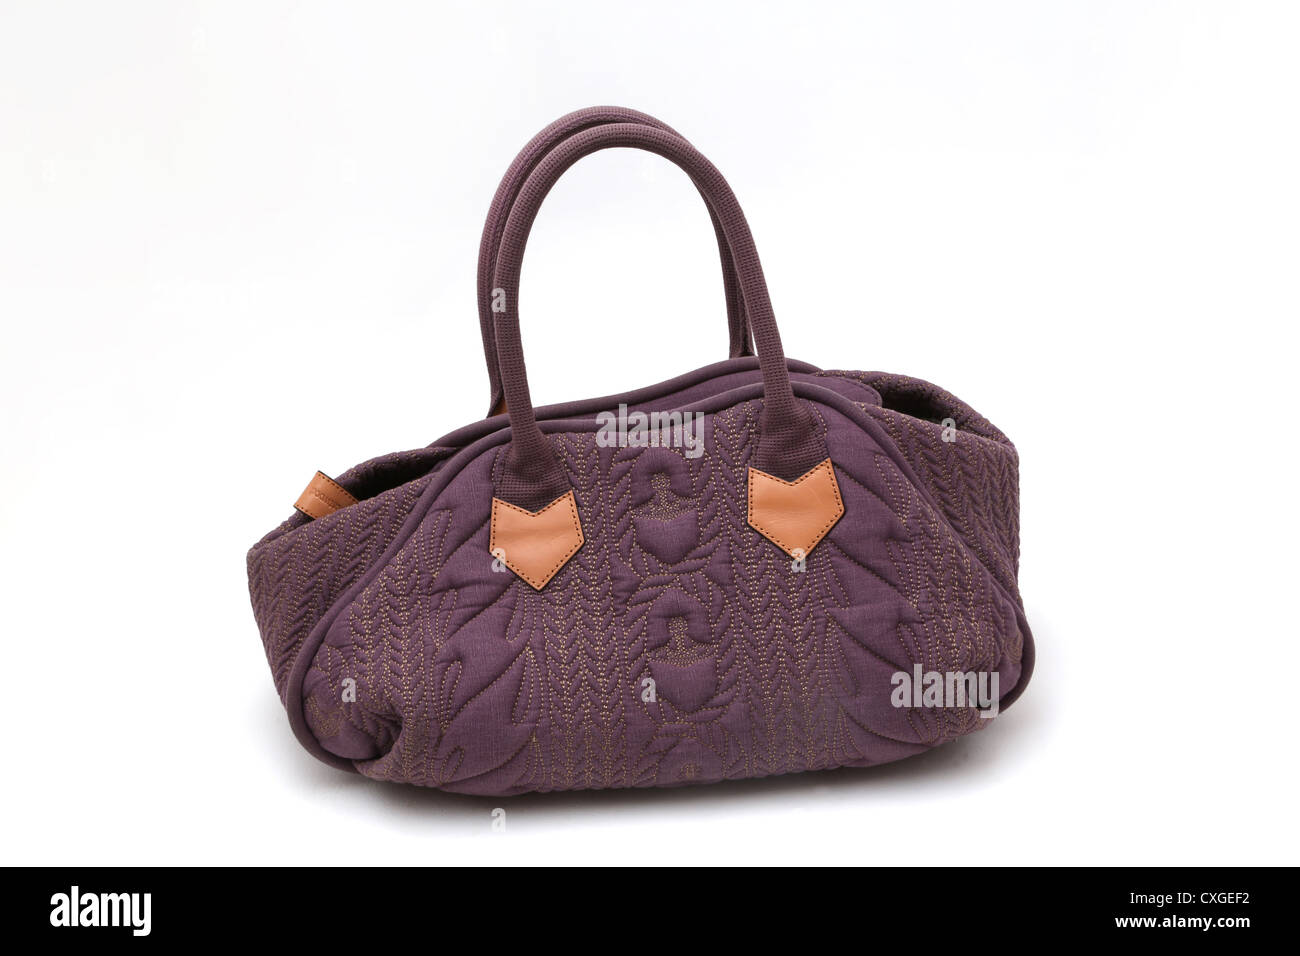 1dfa856db93f Designer Handbag Stock Photos & Designer Handbag Stock Images - Alamy